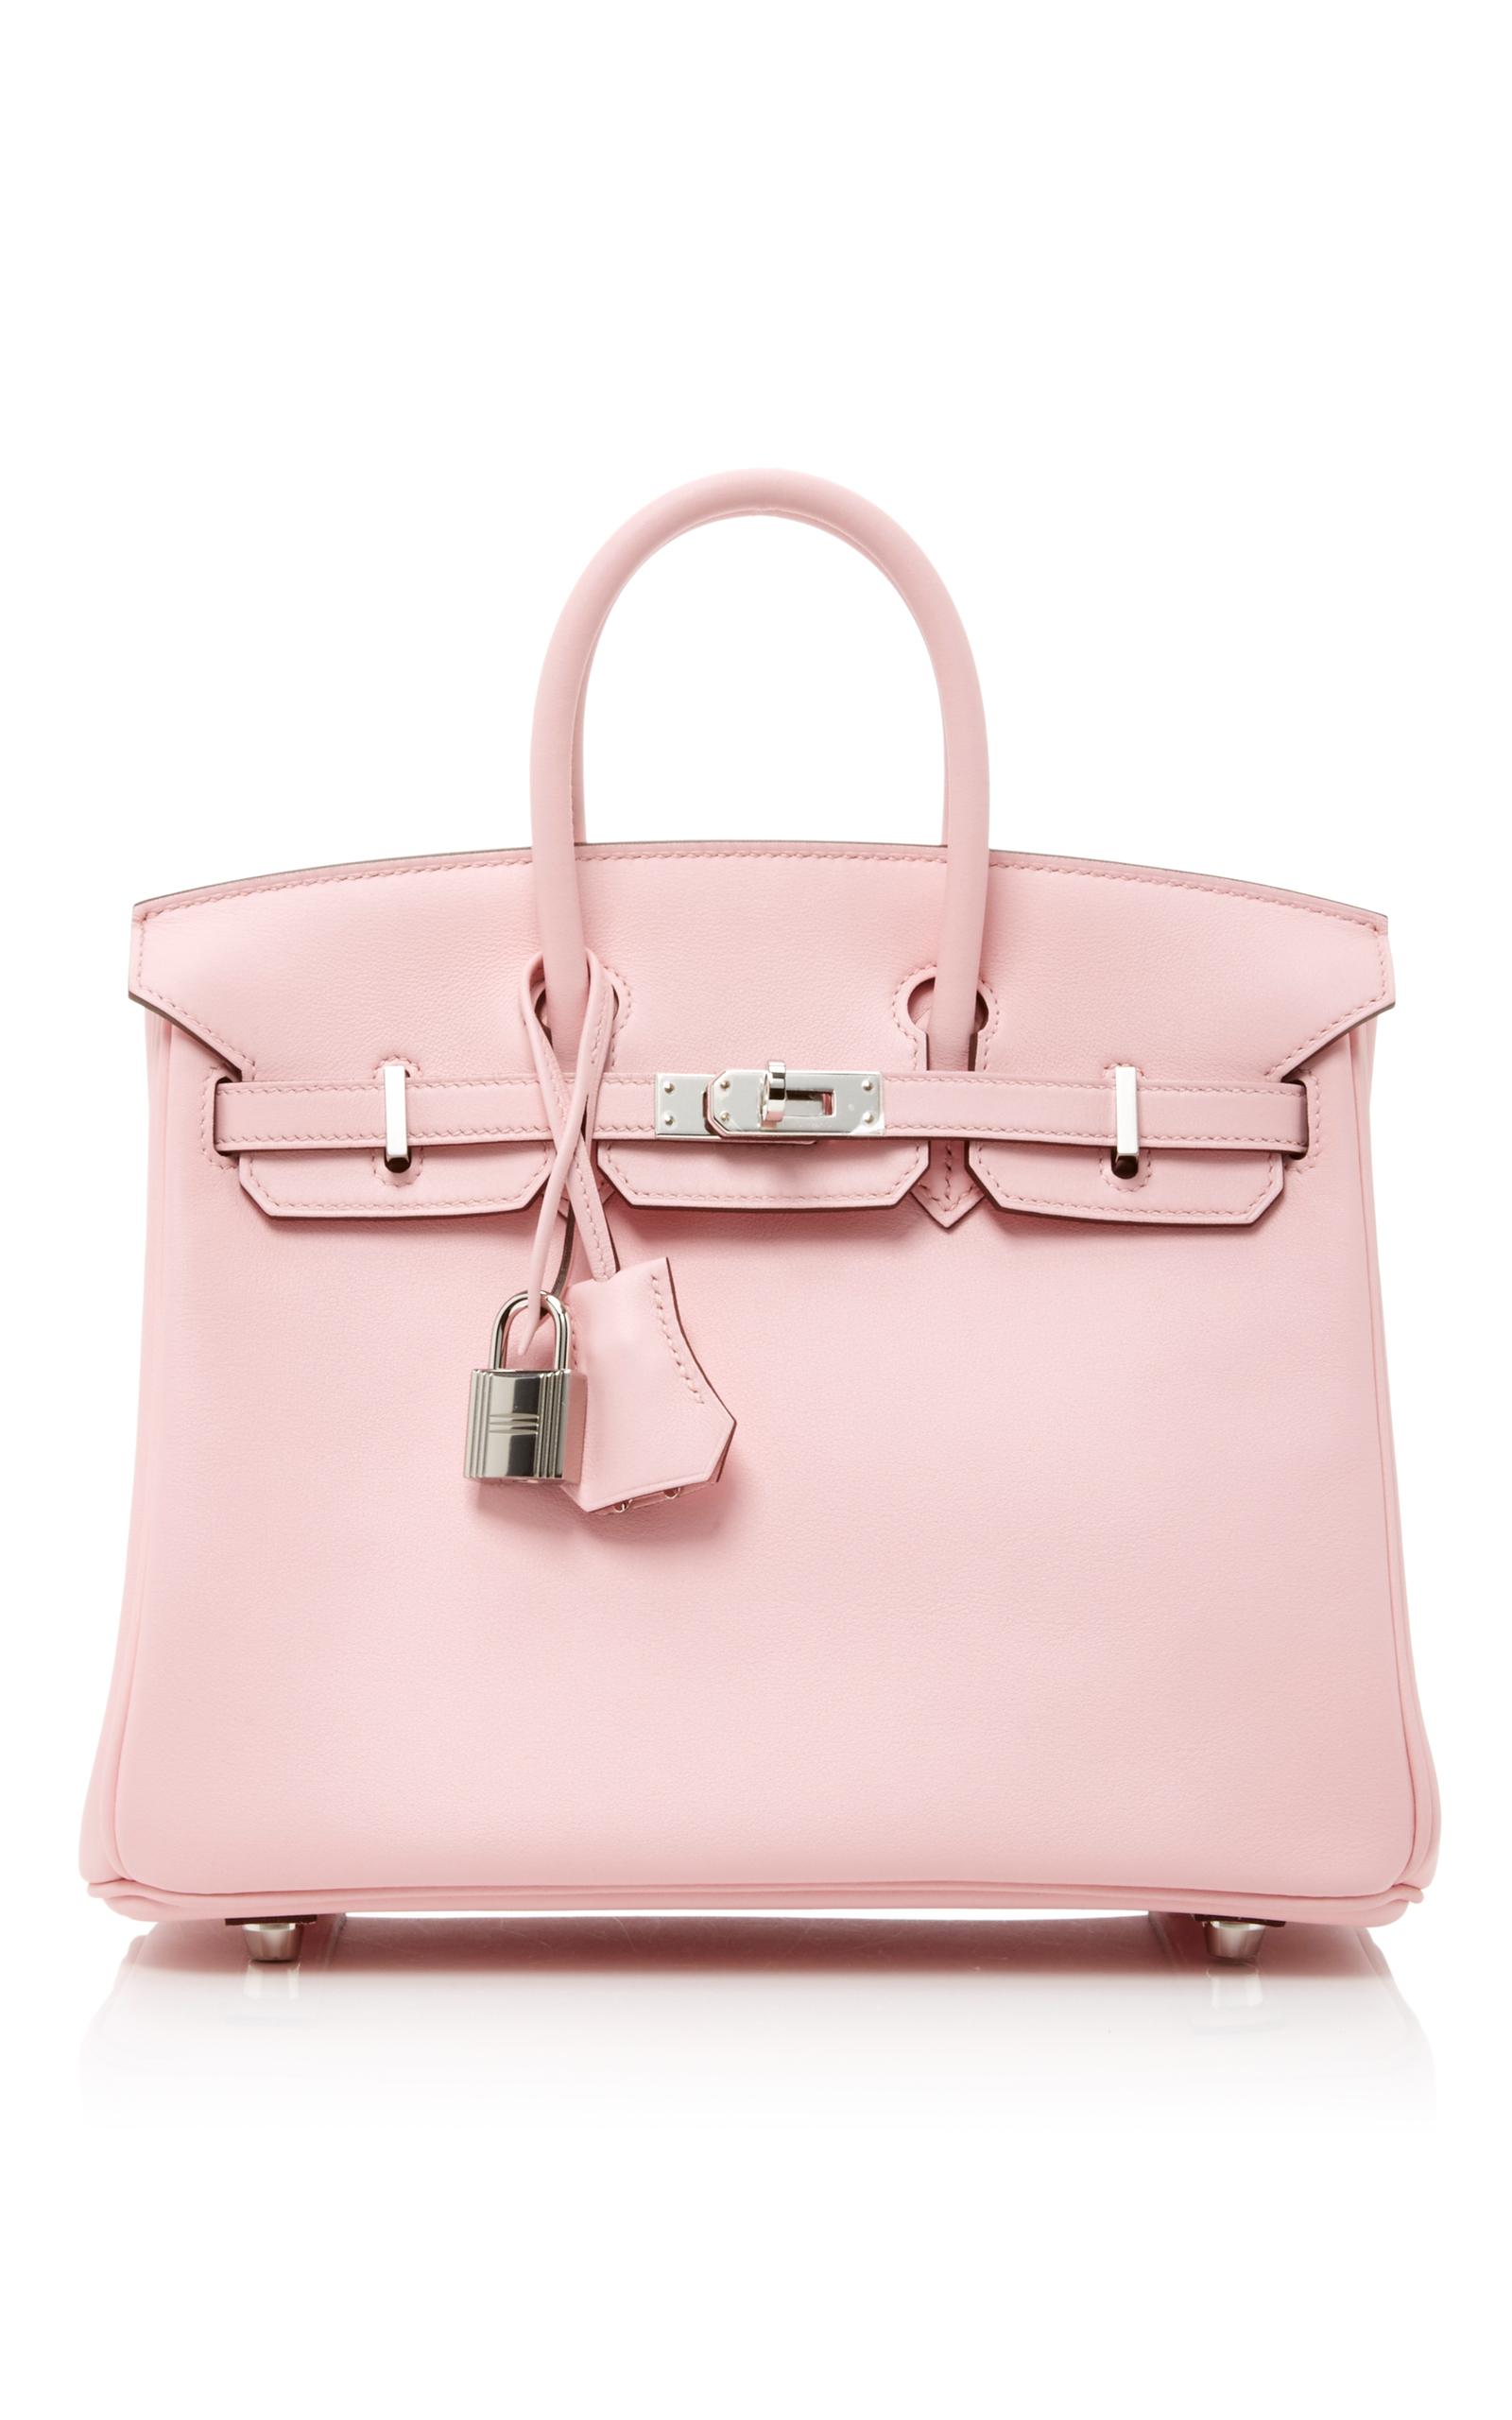 c6a0b48e0a2a Hermes VintageHermes 25cm Rose Sakura Swift Leather Birkin. CLOSE. Loading